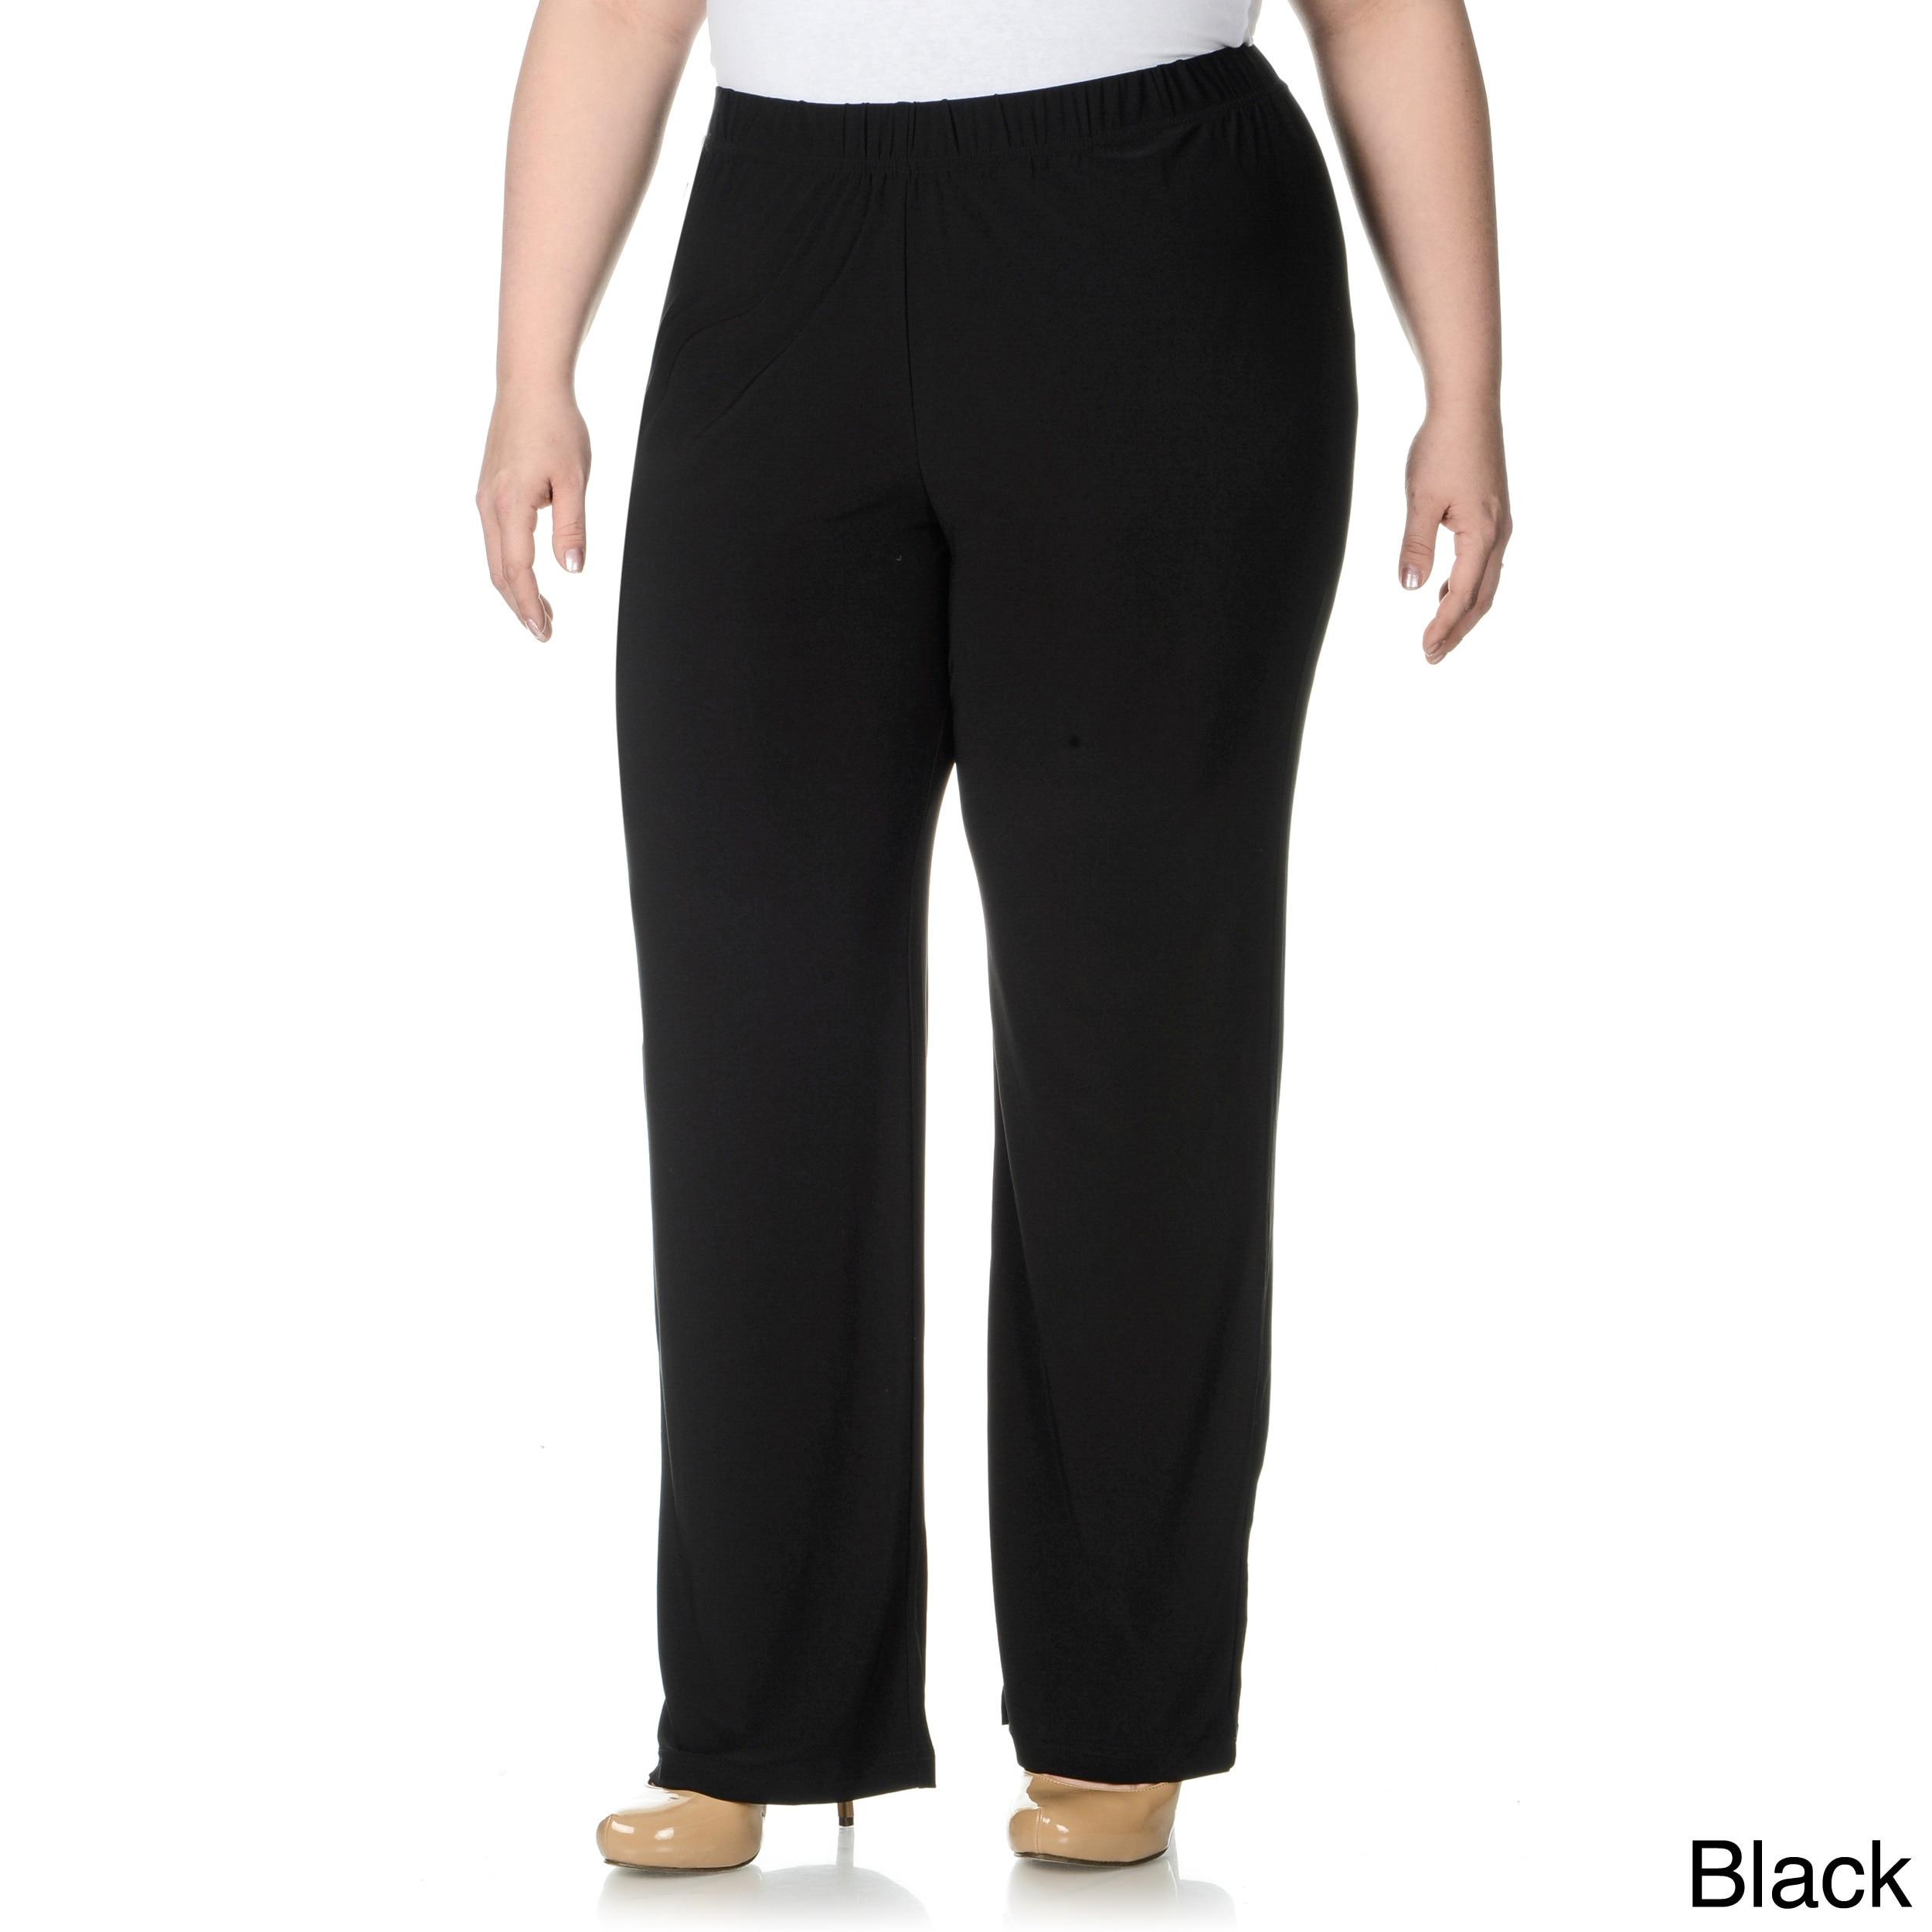 Lennie For Nina Leonard Womens Plus Size Thick Waist Band Pull on Pants